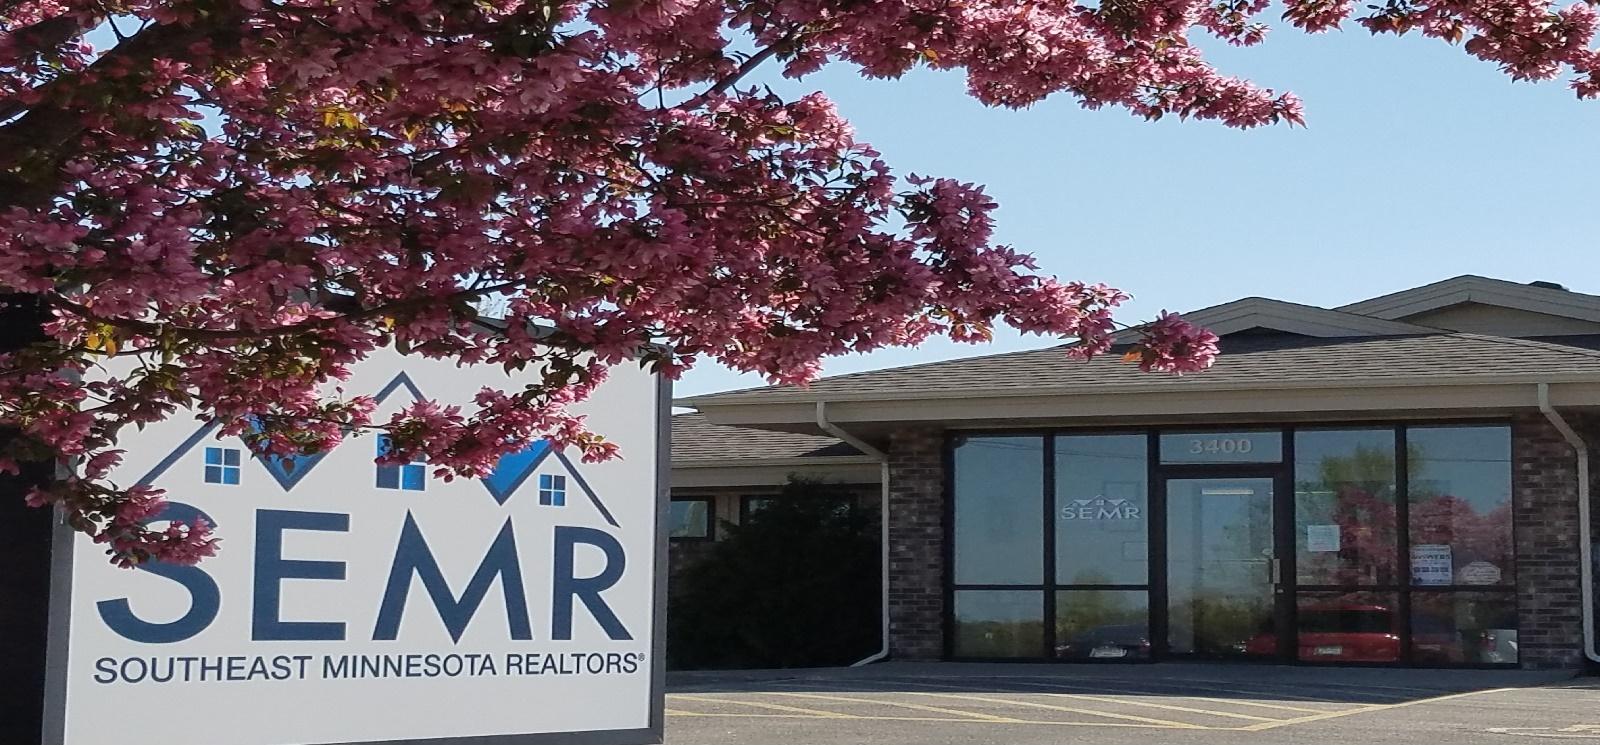 Semr Southeast Minnesota Realtors